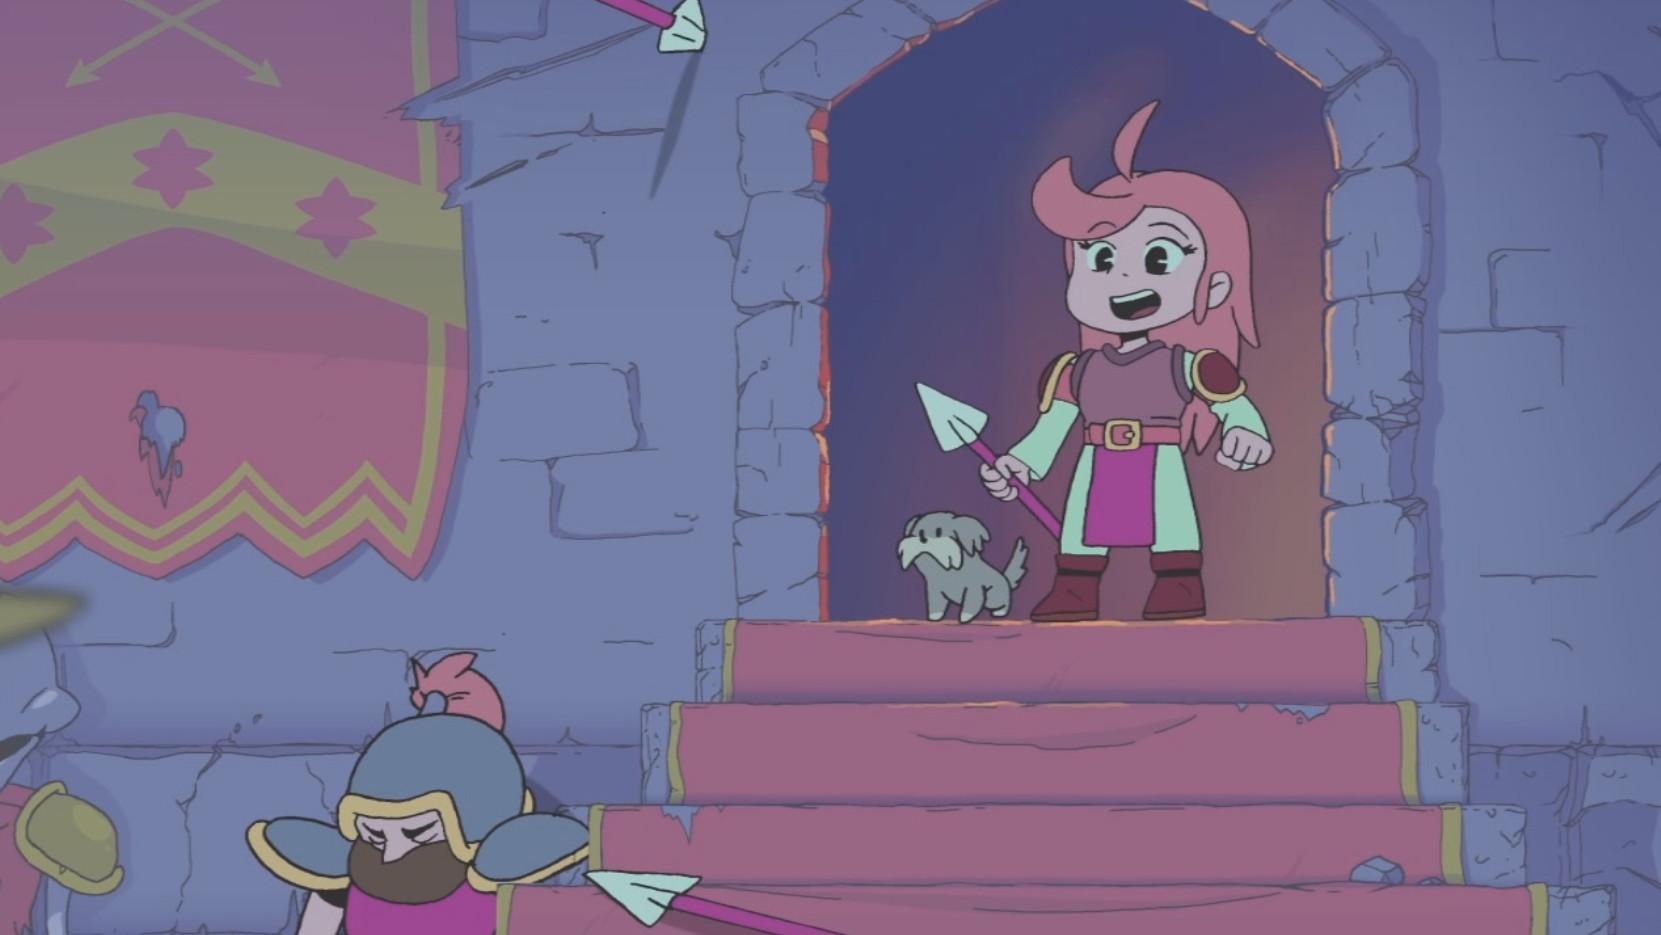 Battle Princess Madelyn multiplatform release announced